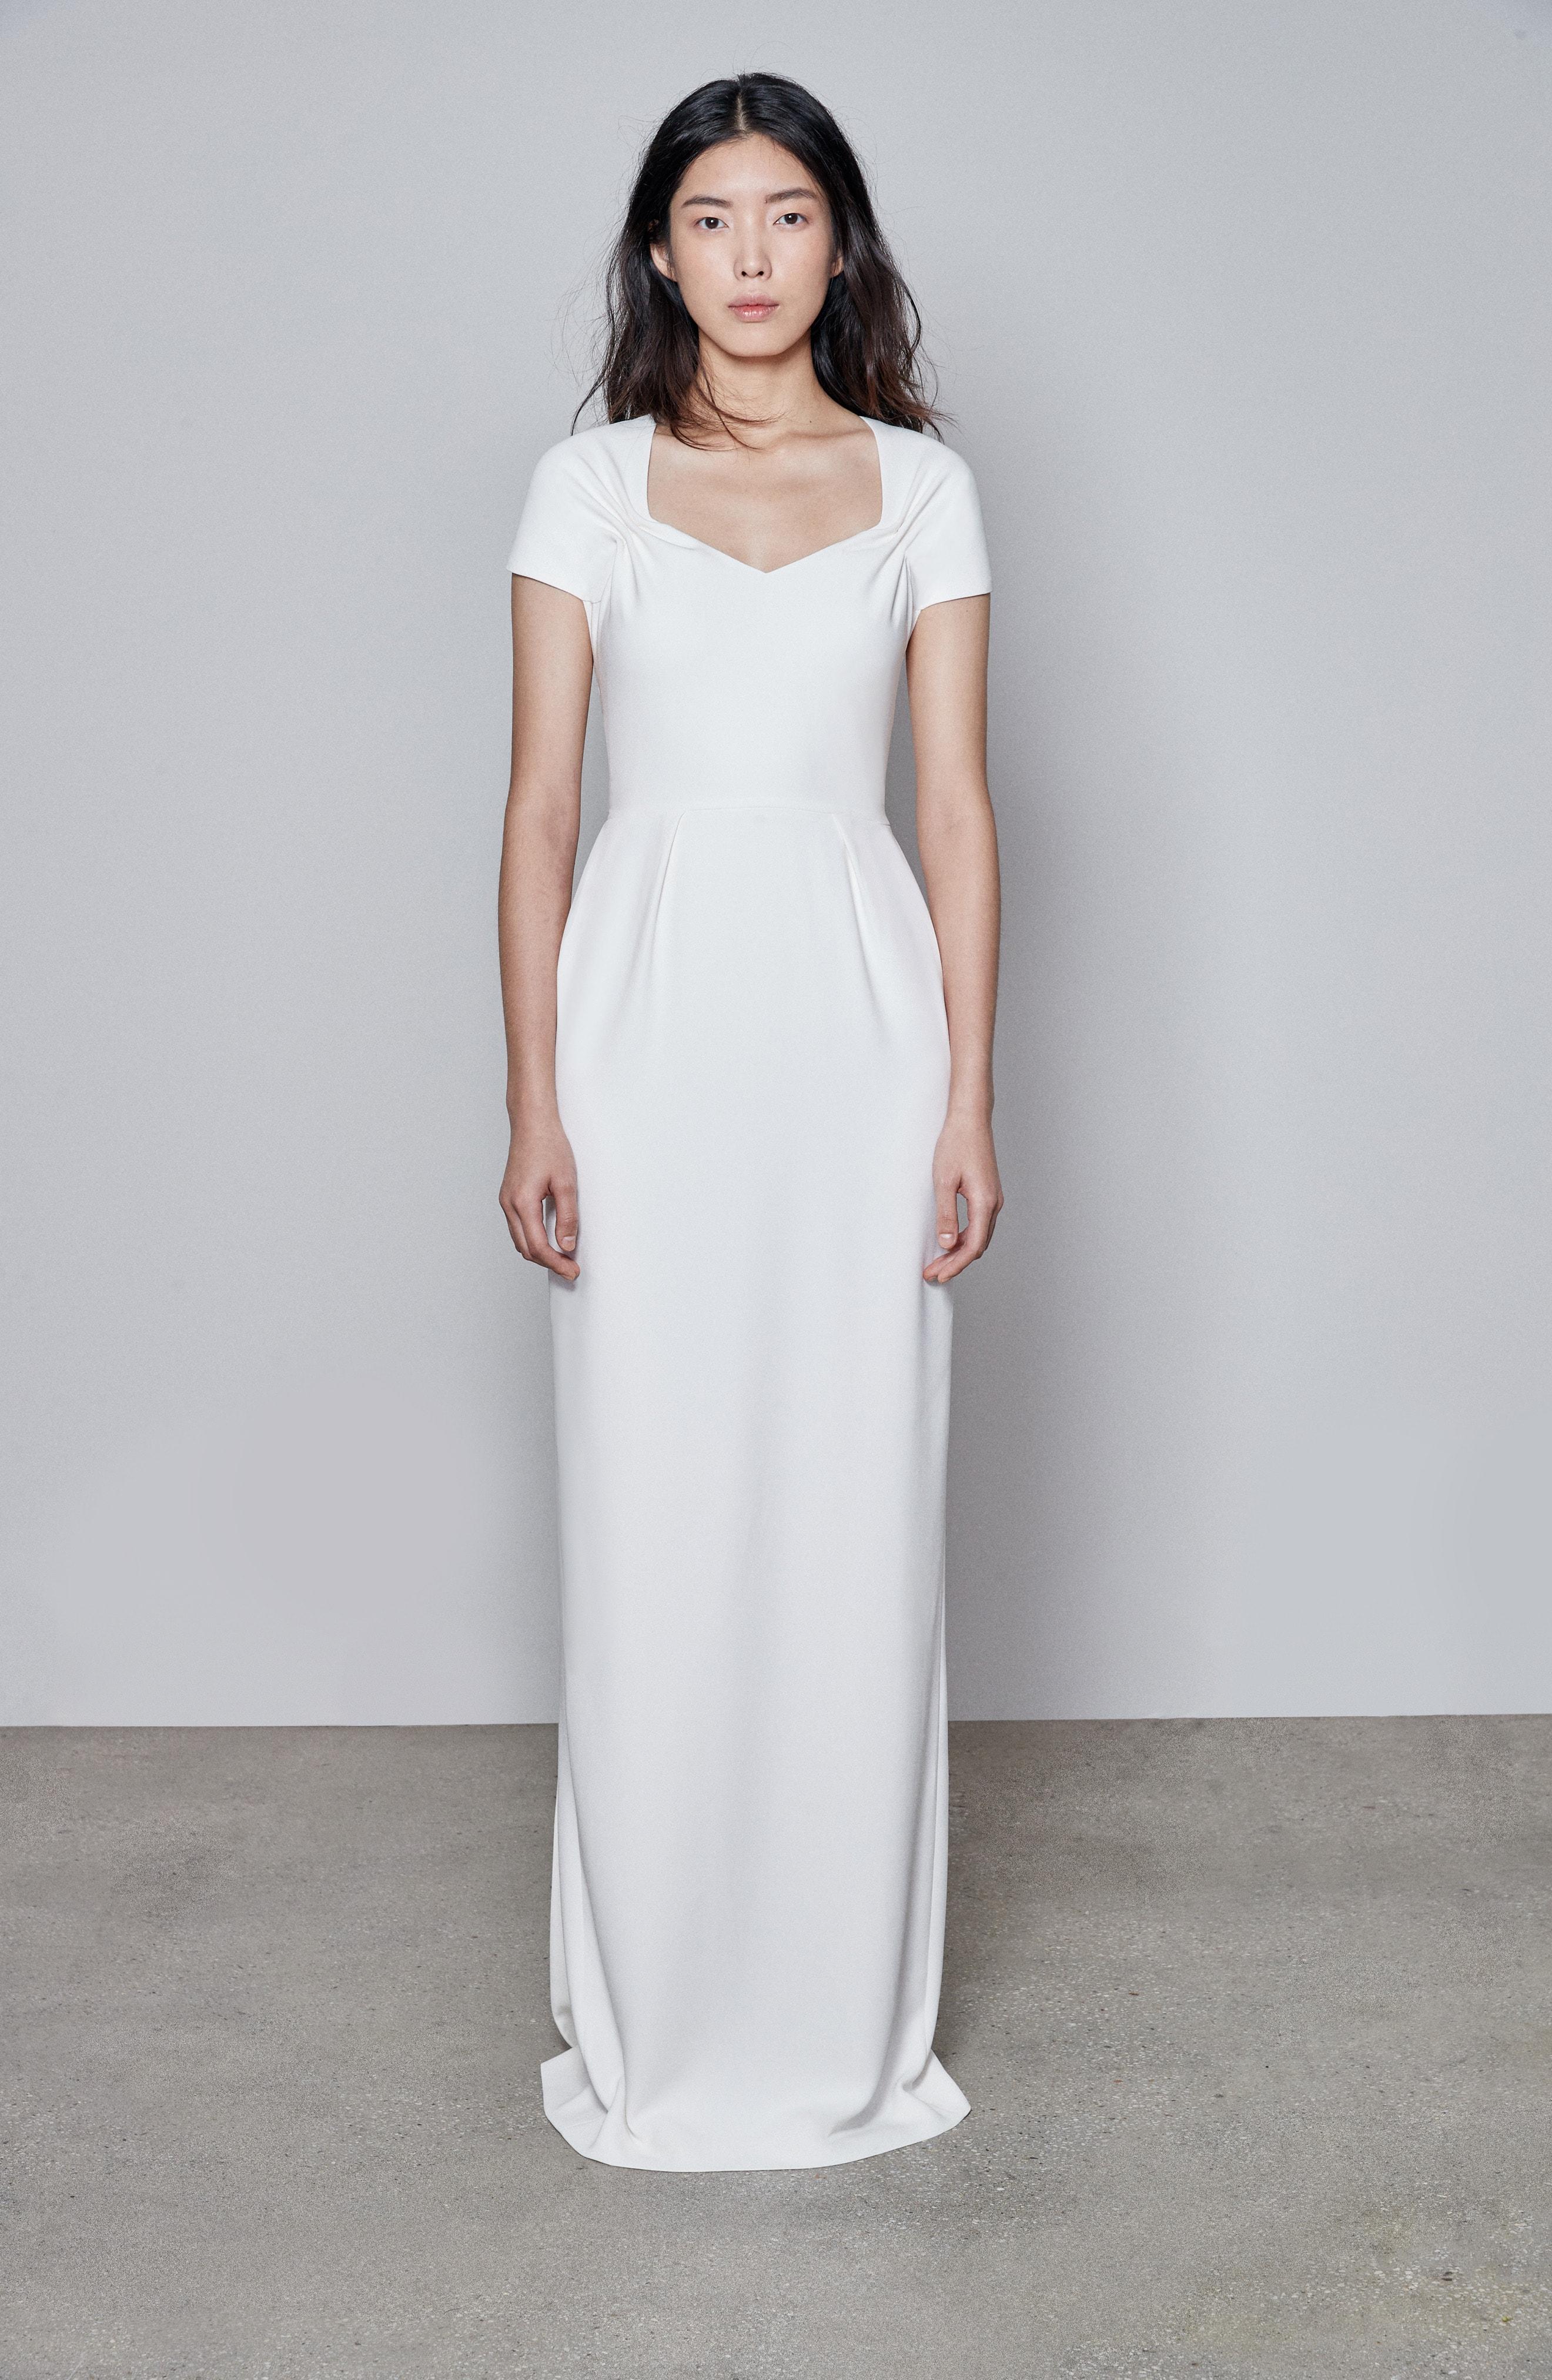 1836d9c2c4d Lyst - Stella McCartney F18 Rose Cap Sleeve Wedding Dress in White